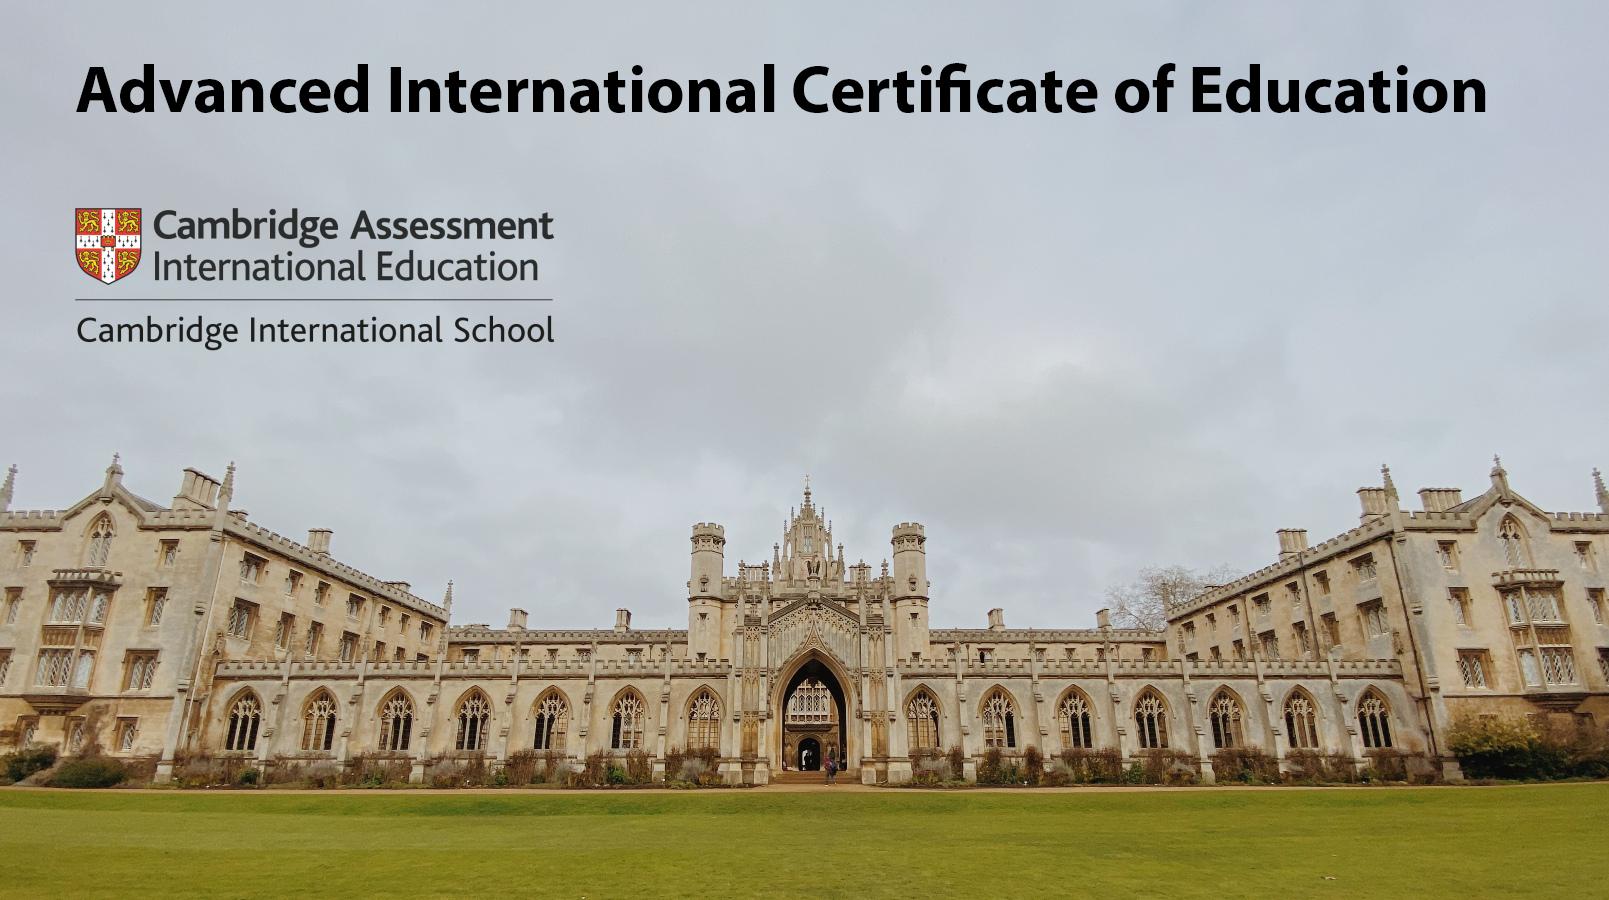 aice Advanced International Certificate of Education